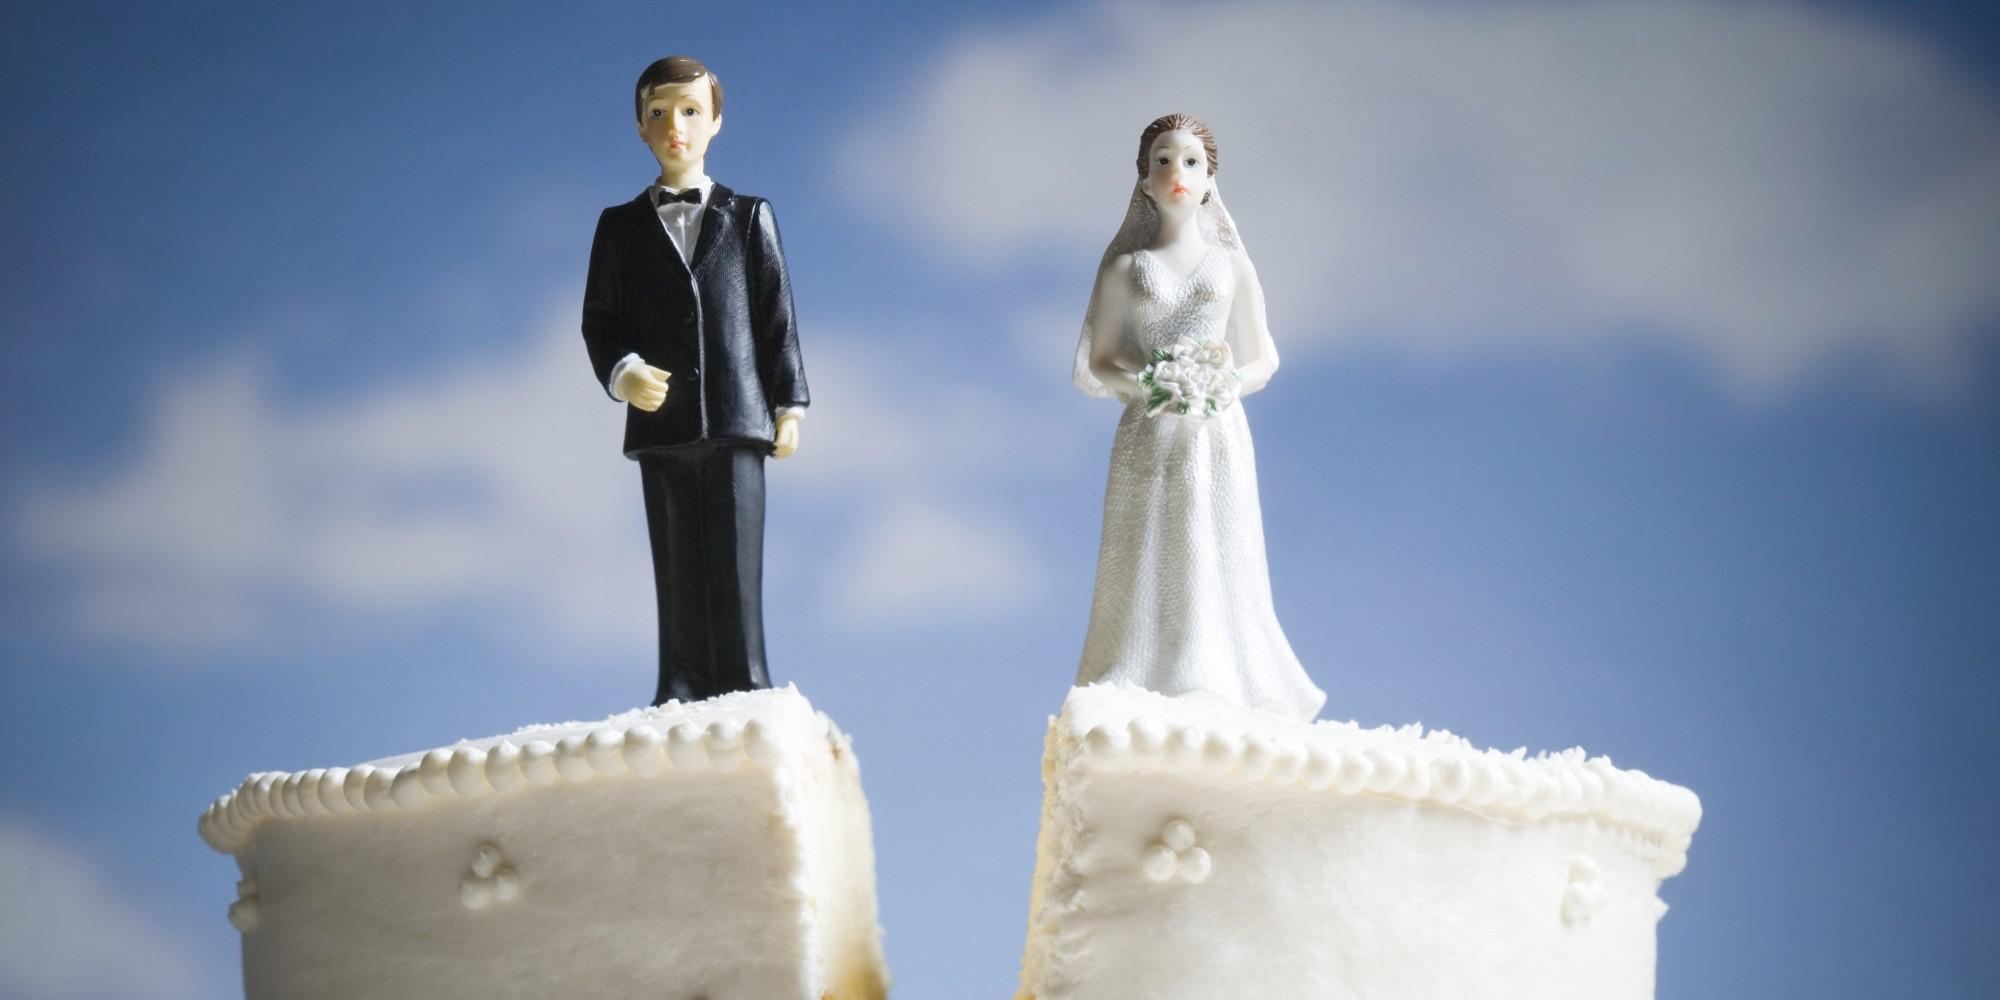 Why We Need Spousal Refusal | HuffPost